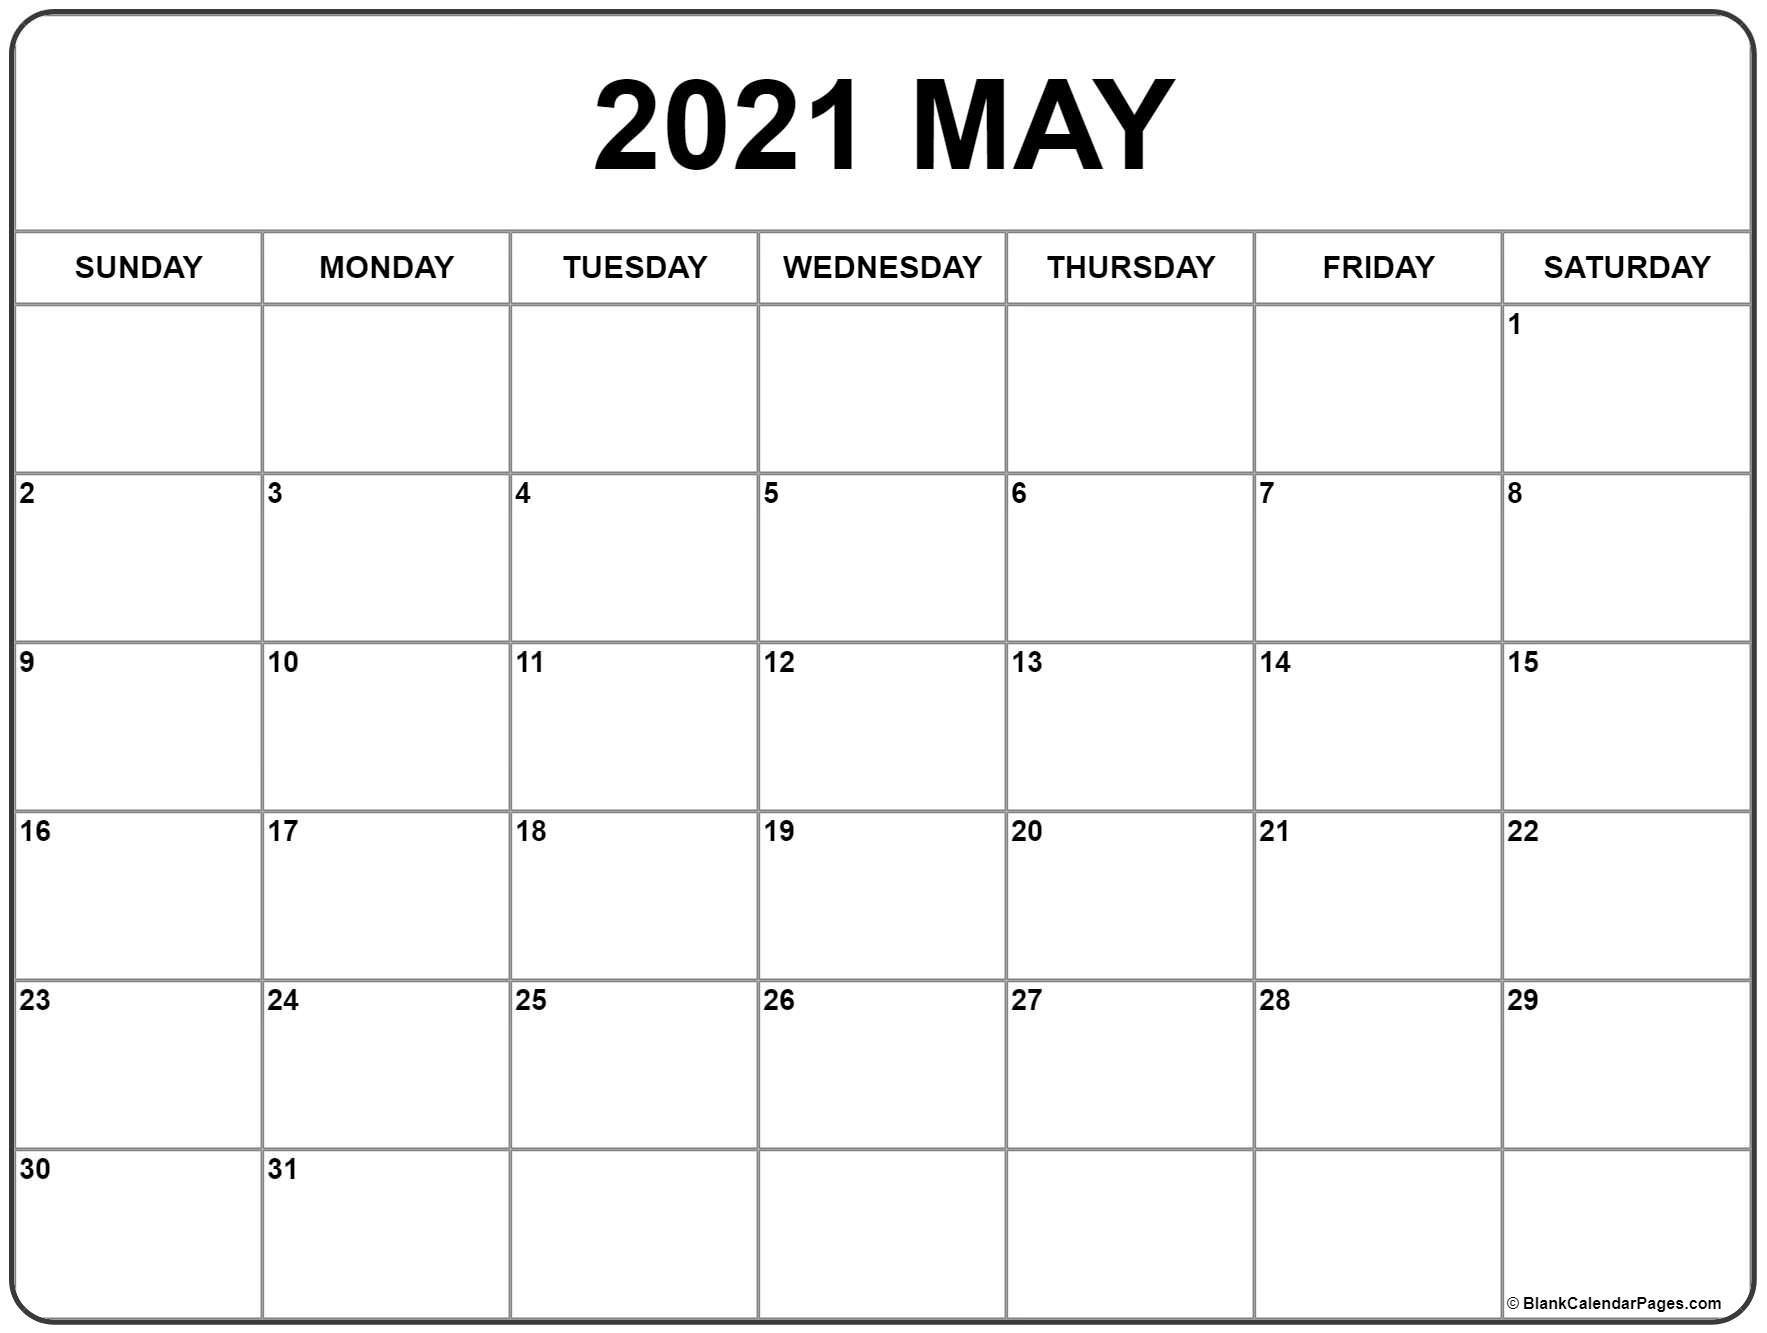 Calendar May 2021 Blank